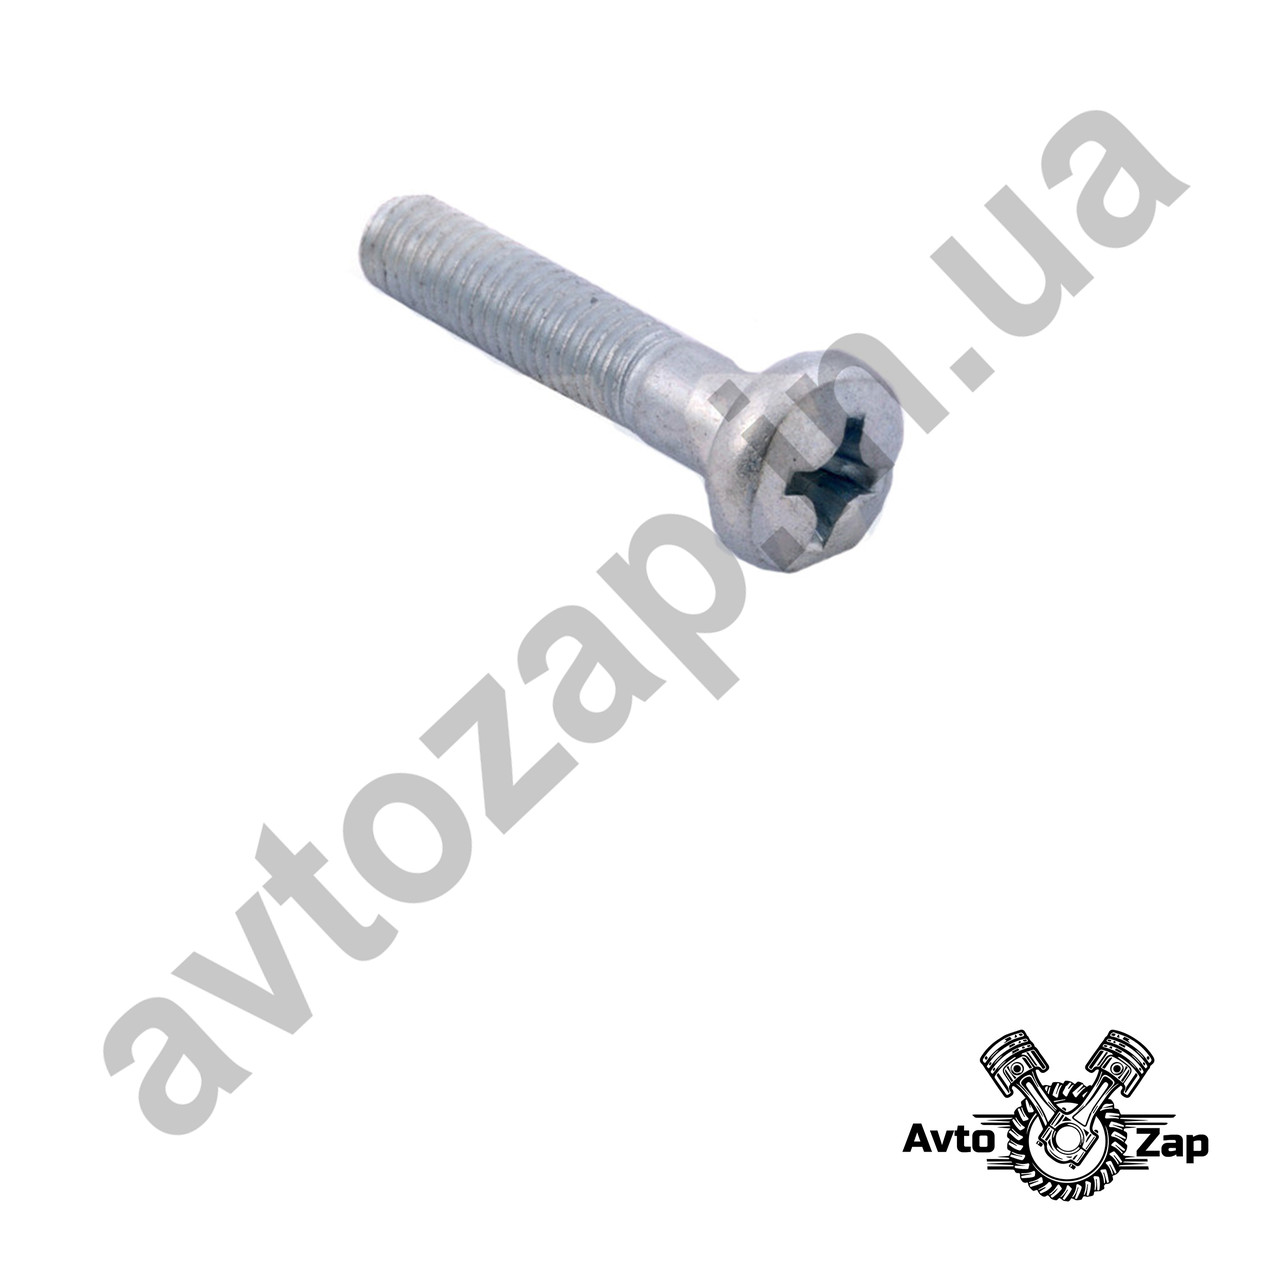 Болт М6х30 подлокотника ручки двери ВАЗ 2101-07 длинн      15271